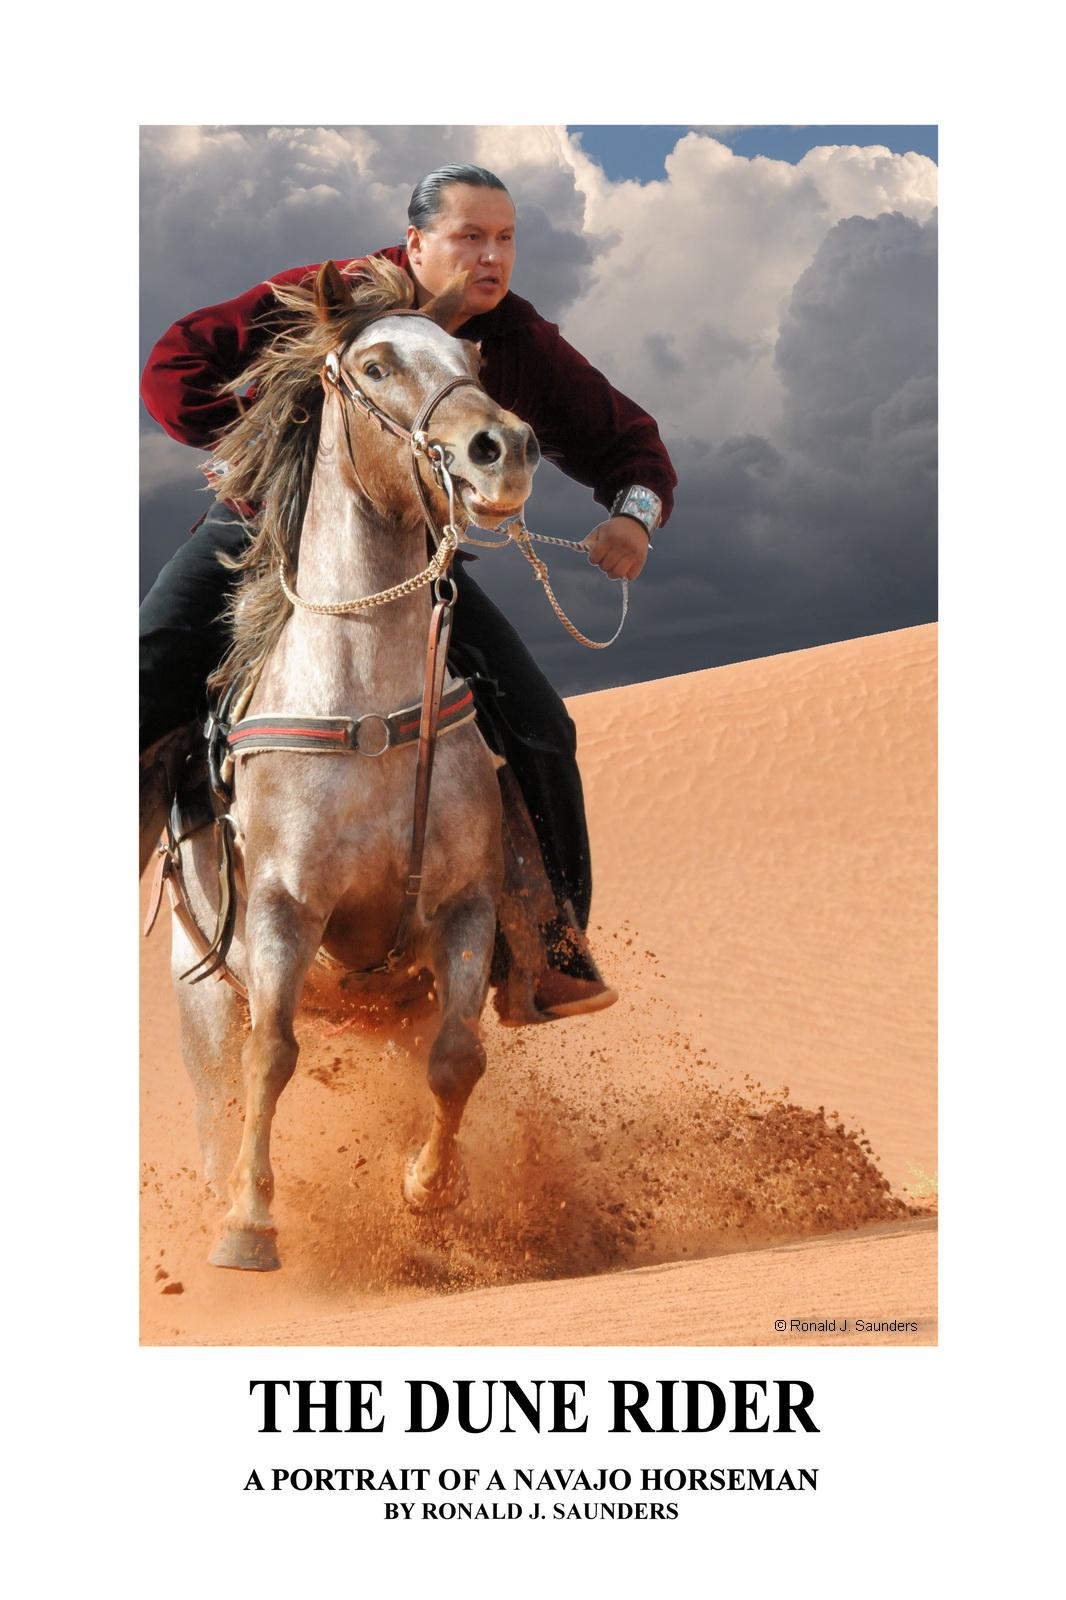 chinle, Arizona, horse, rider,  ron, ronald, saunders, landscape, fine art, keeble, shuchat, exhibition, photo